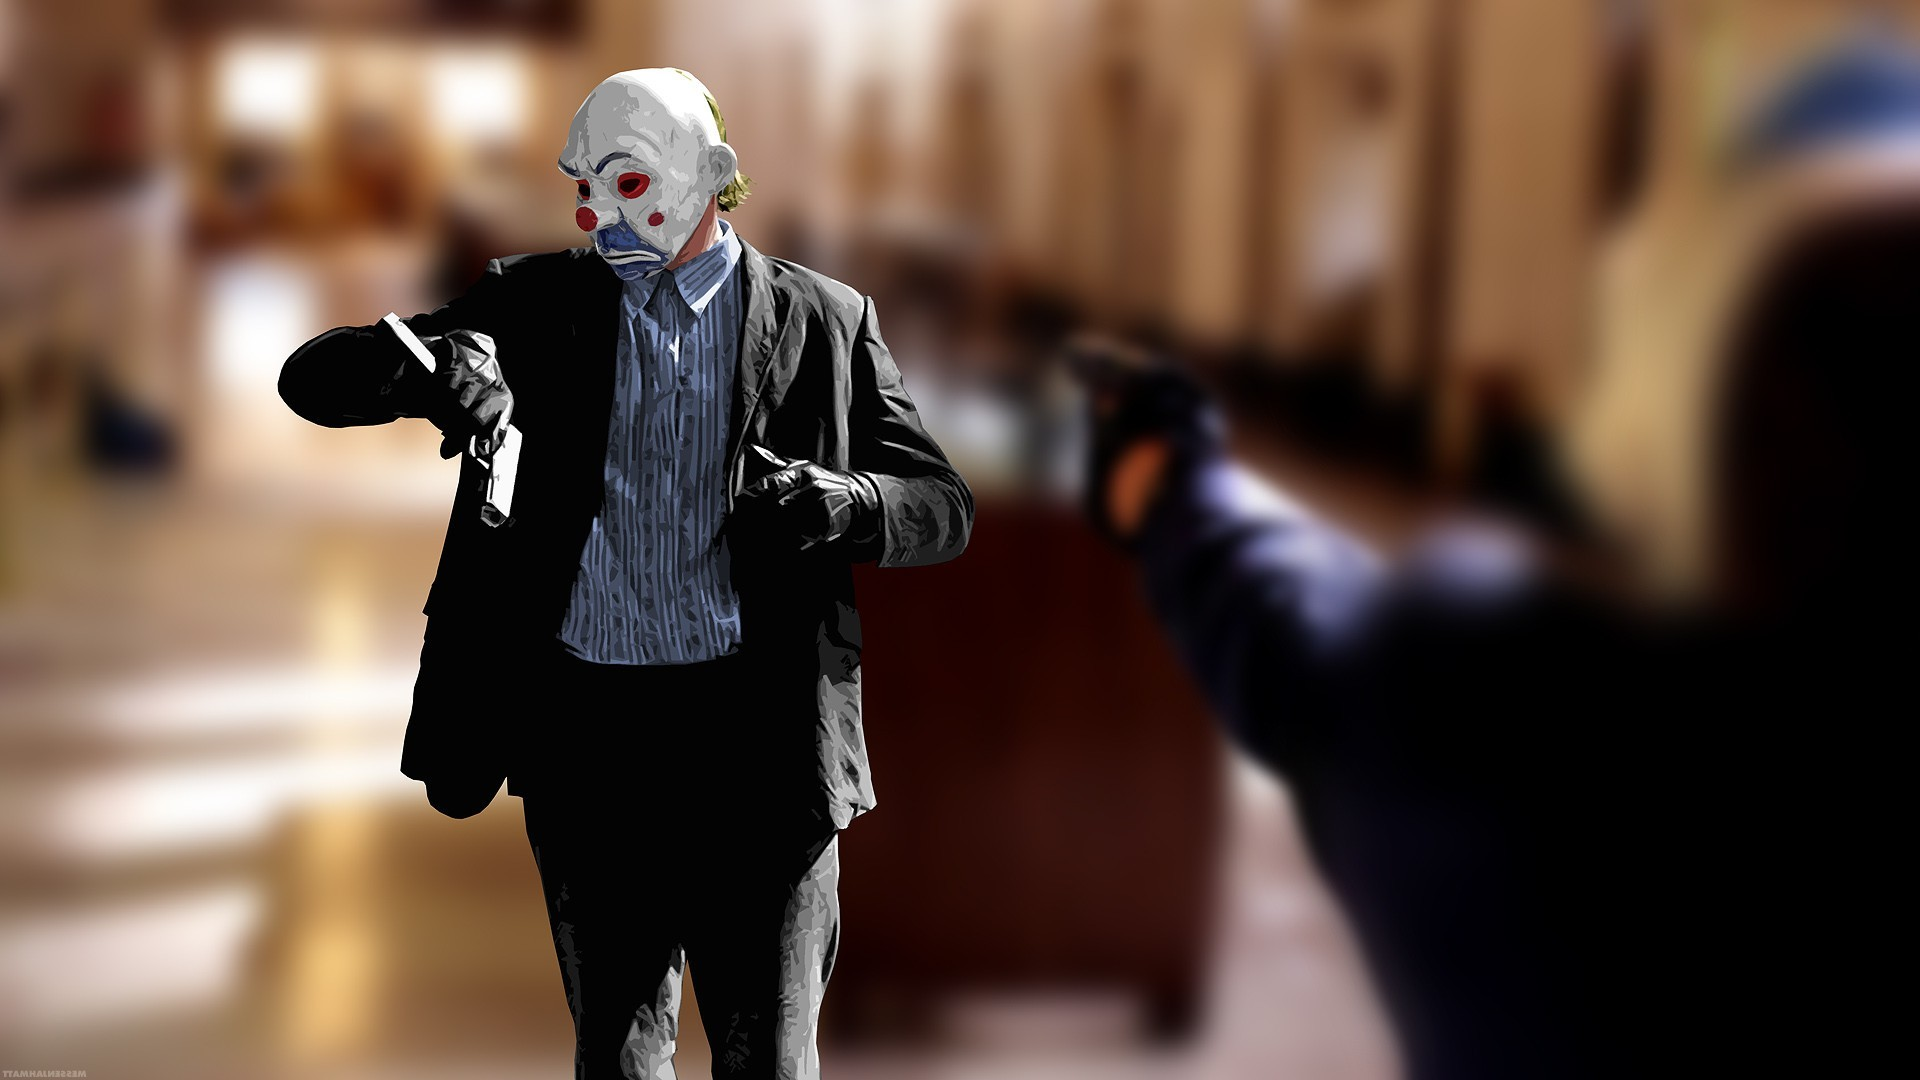 Awesome <b>Heath Ledger HD</b> Wallpaper Free Download